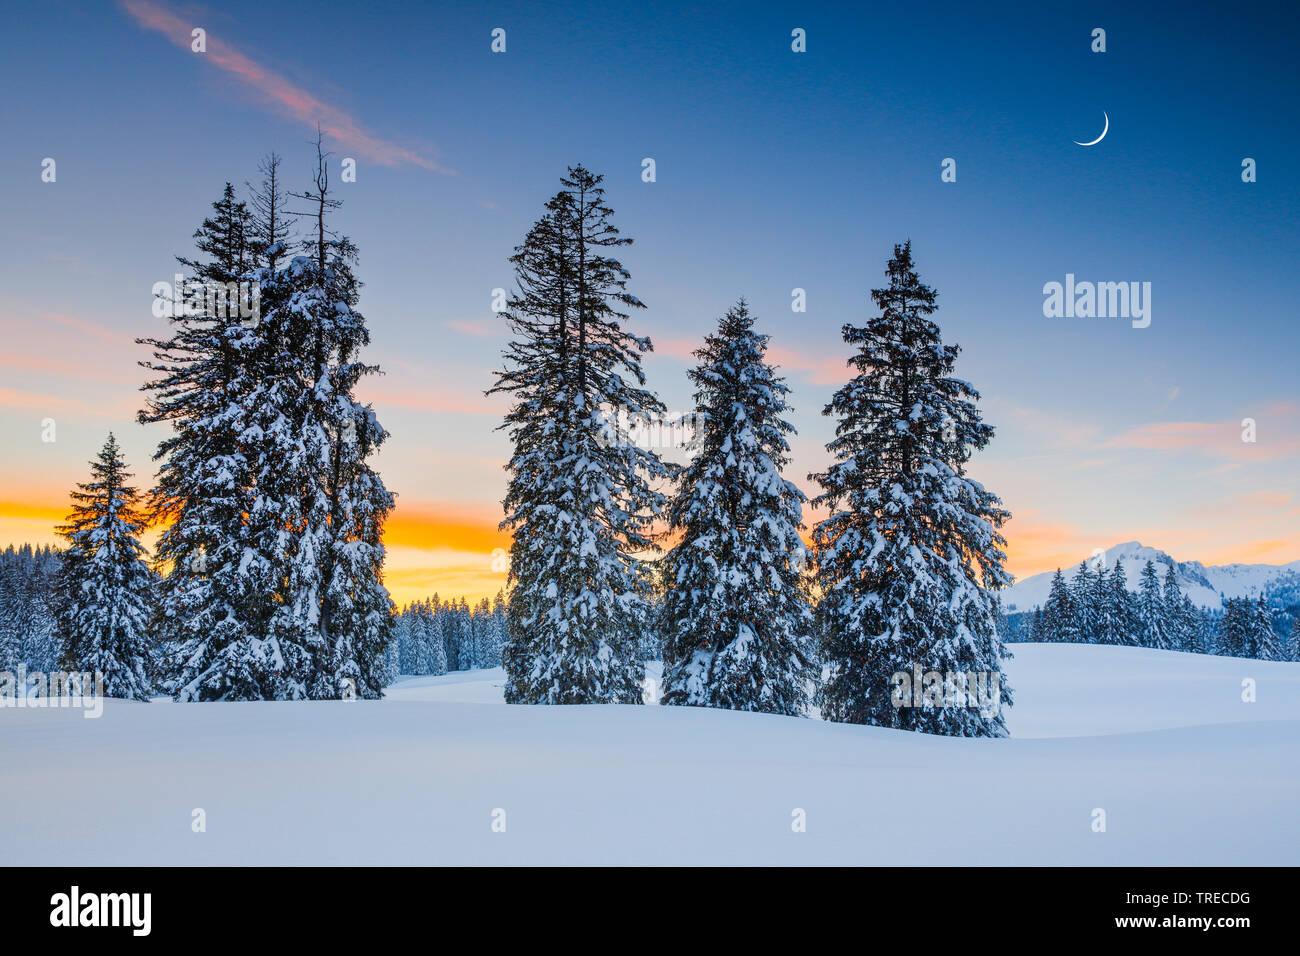 Sonnenuntergang Alp Sellamatt, Schweiz   sunset Alp Sellamatt, Switzerland   BLWS522845.jpg [ (c) blickwinkel/P. Frischknecht Tel. +49 (0)2302-2793220 - Stock Image